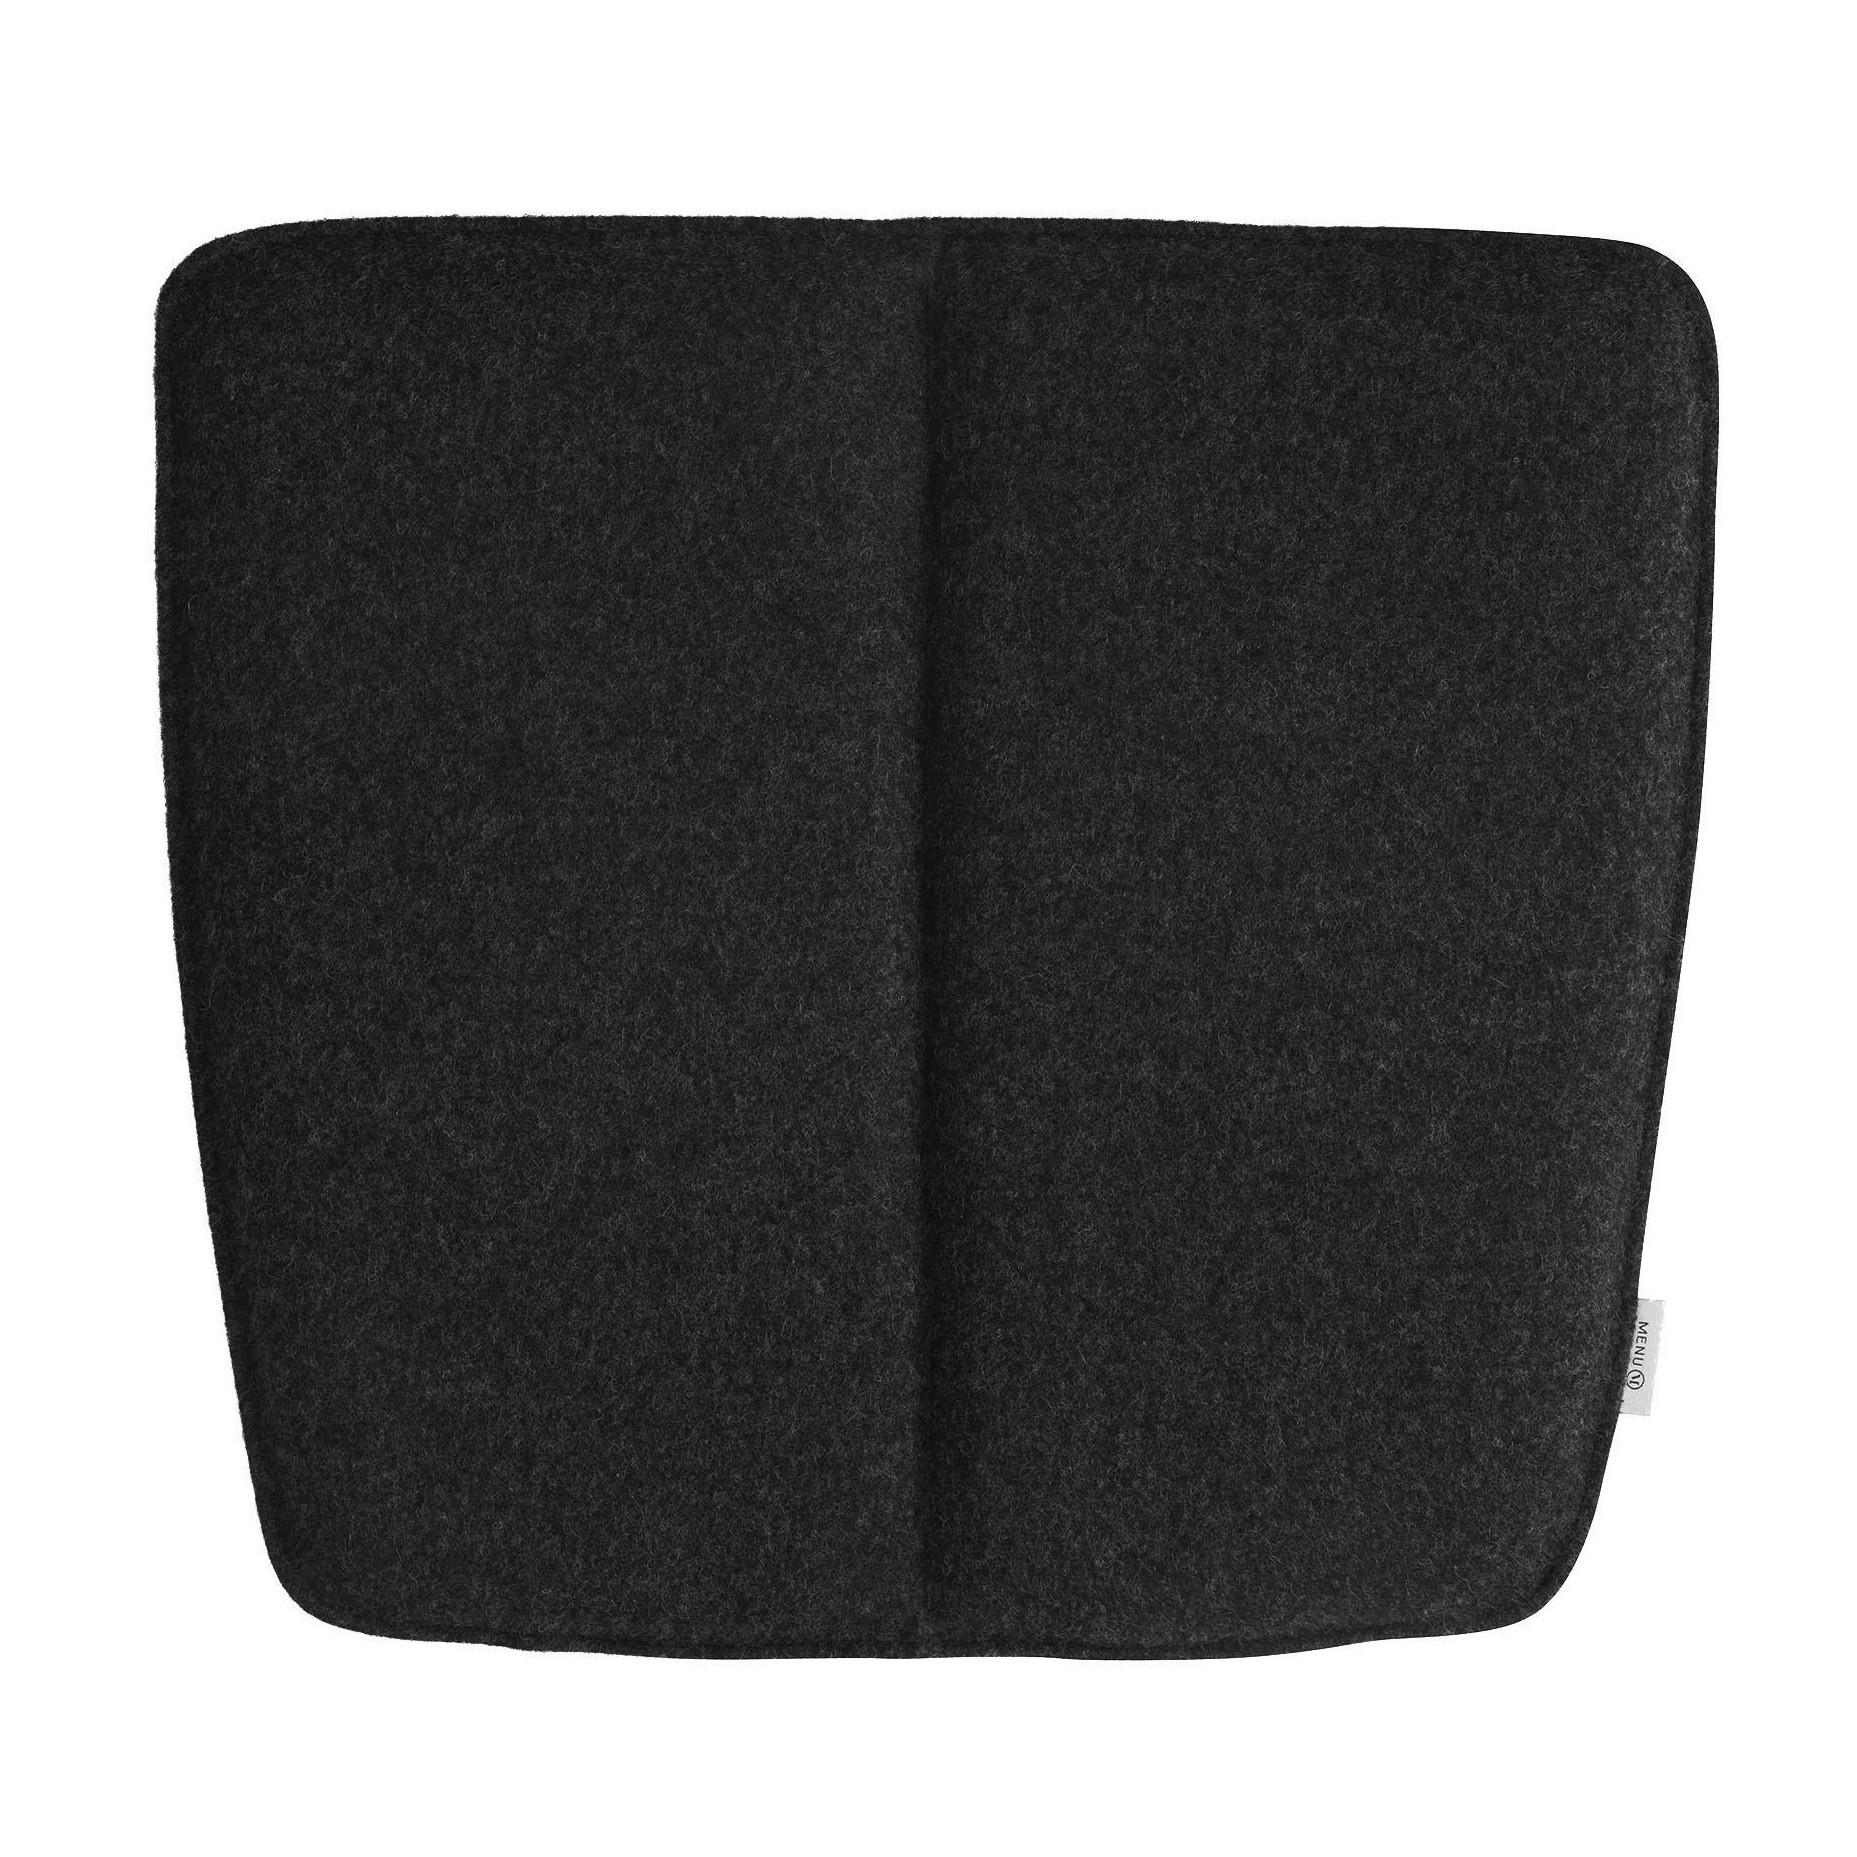 Menu Wm String Dining Chair Seat Cushion Indoor Ambientedirect